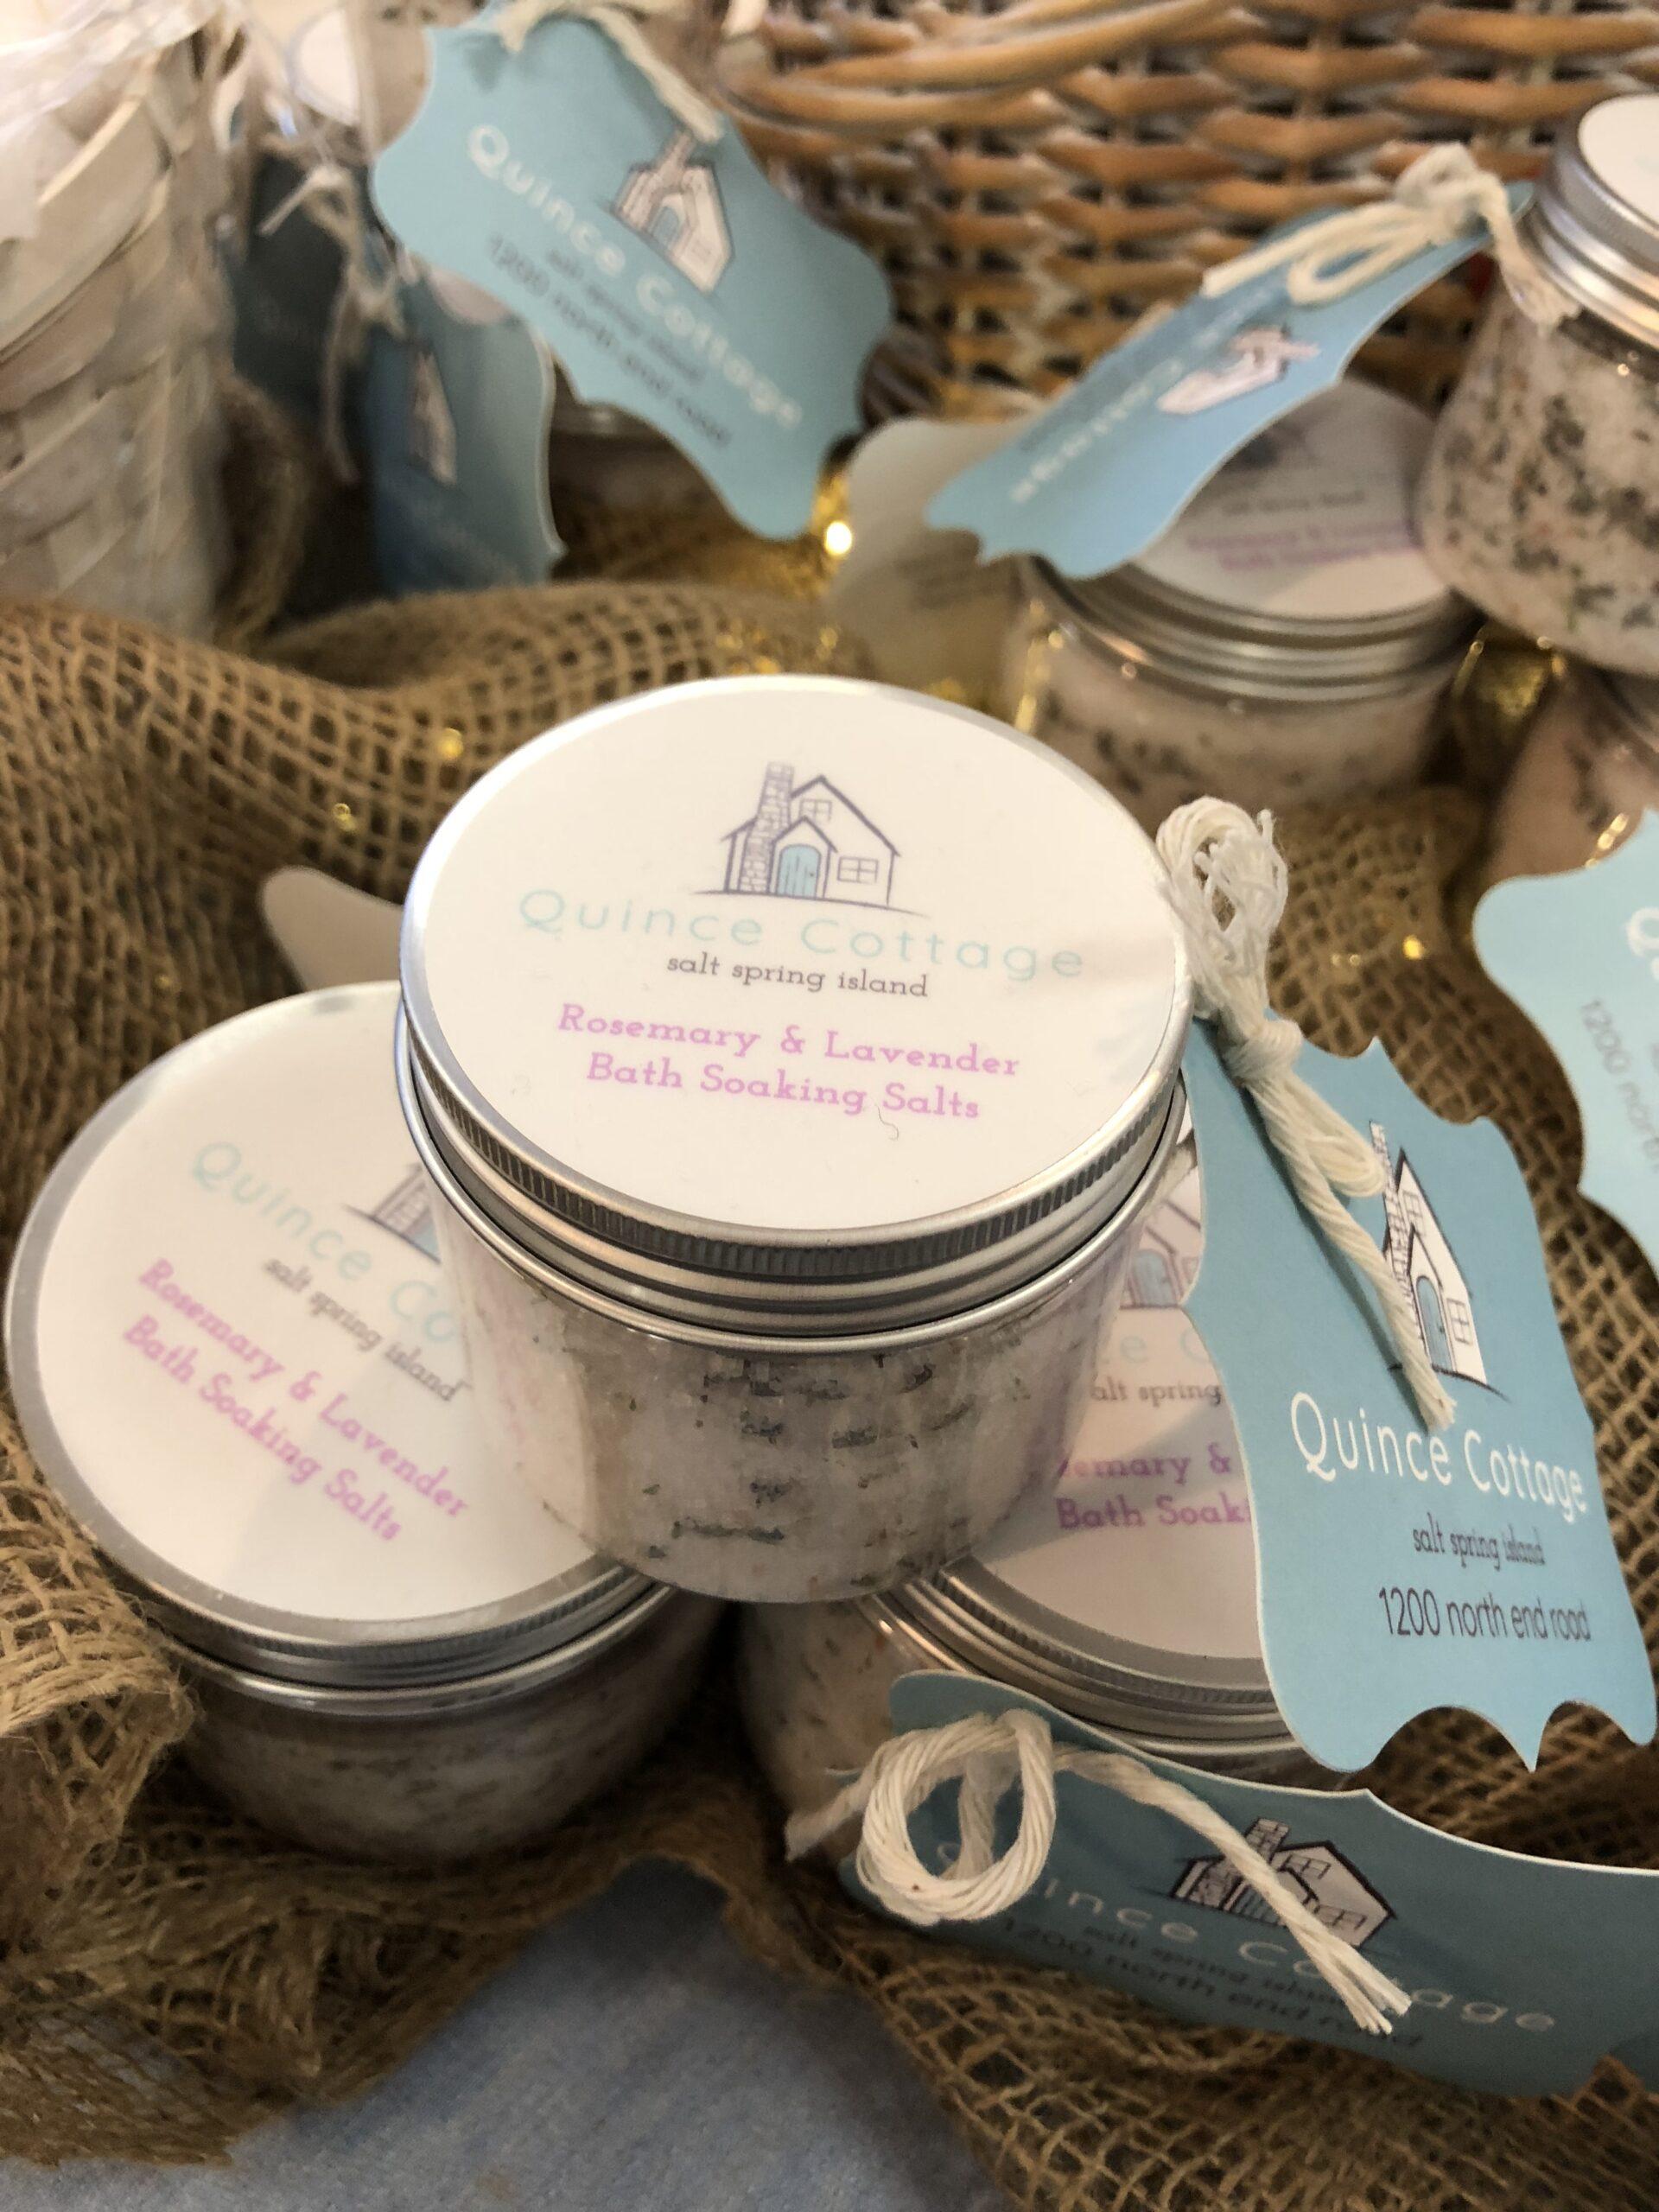 Rosemary & Lavender Bath Soaking Salts